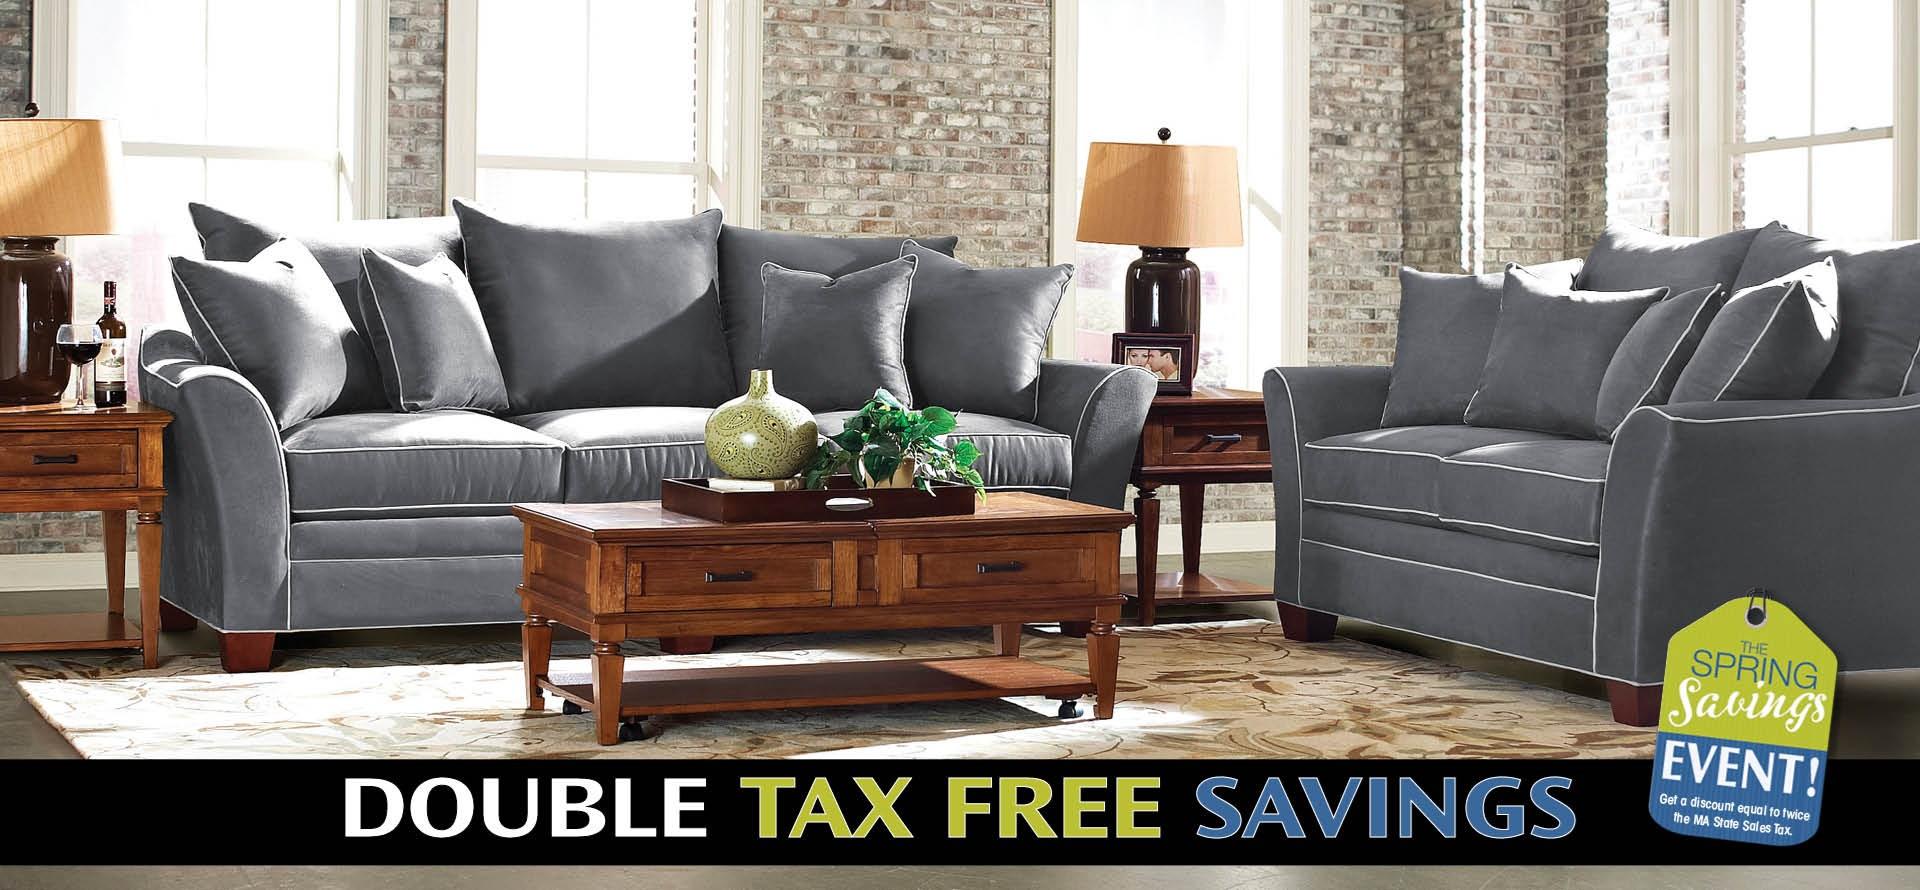 Double Tax Free Savings!